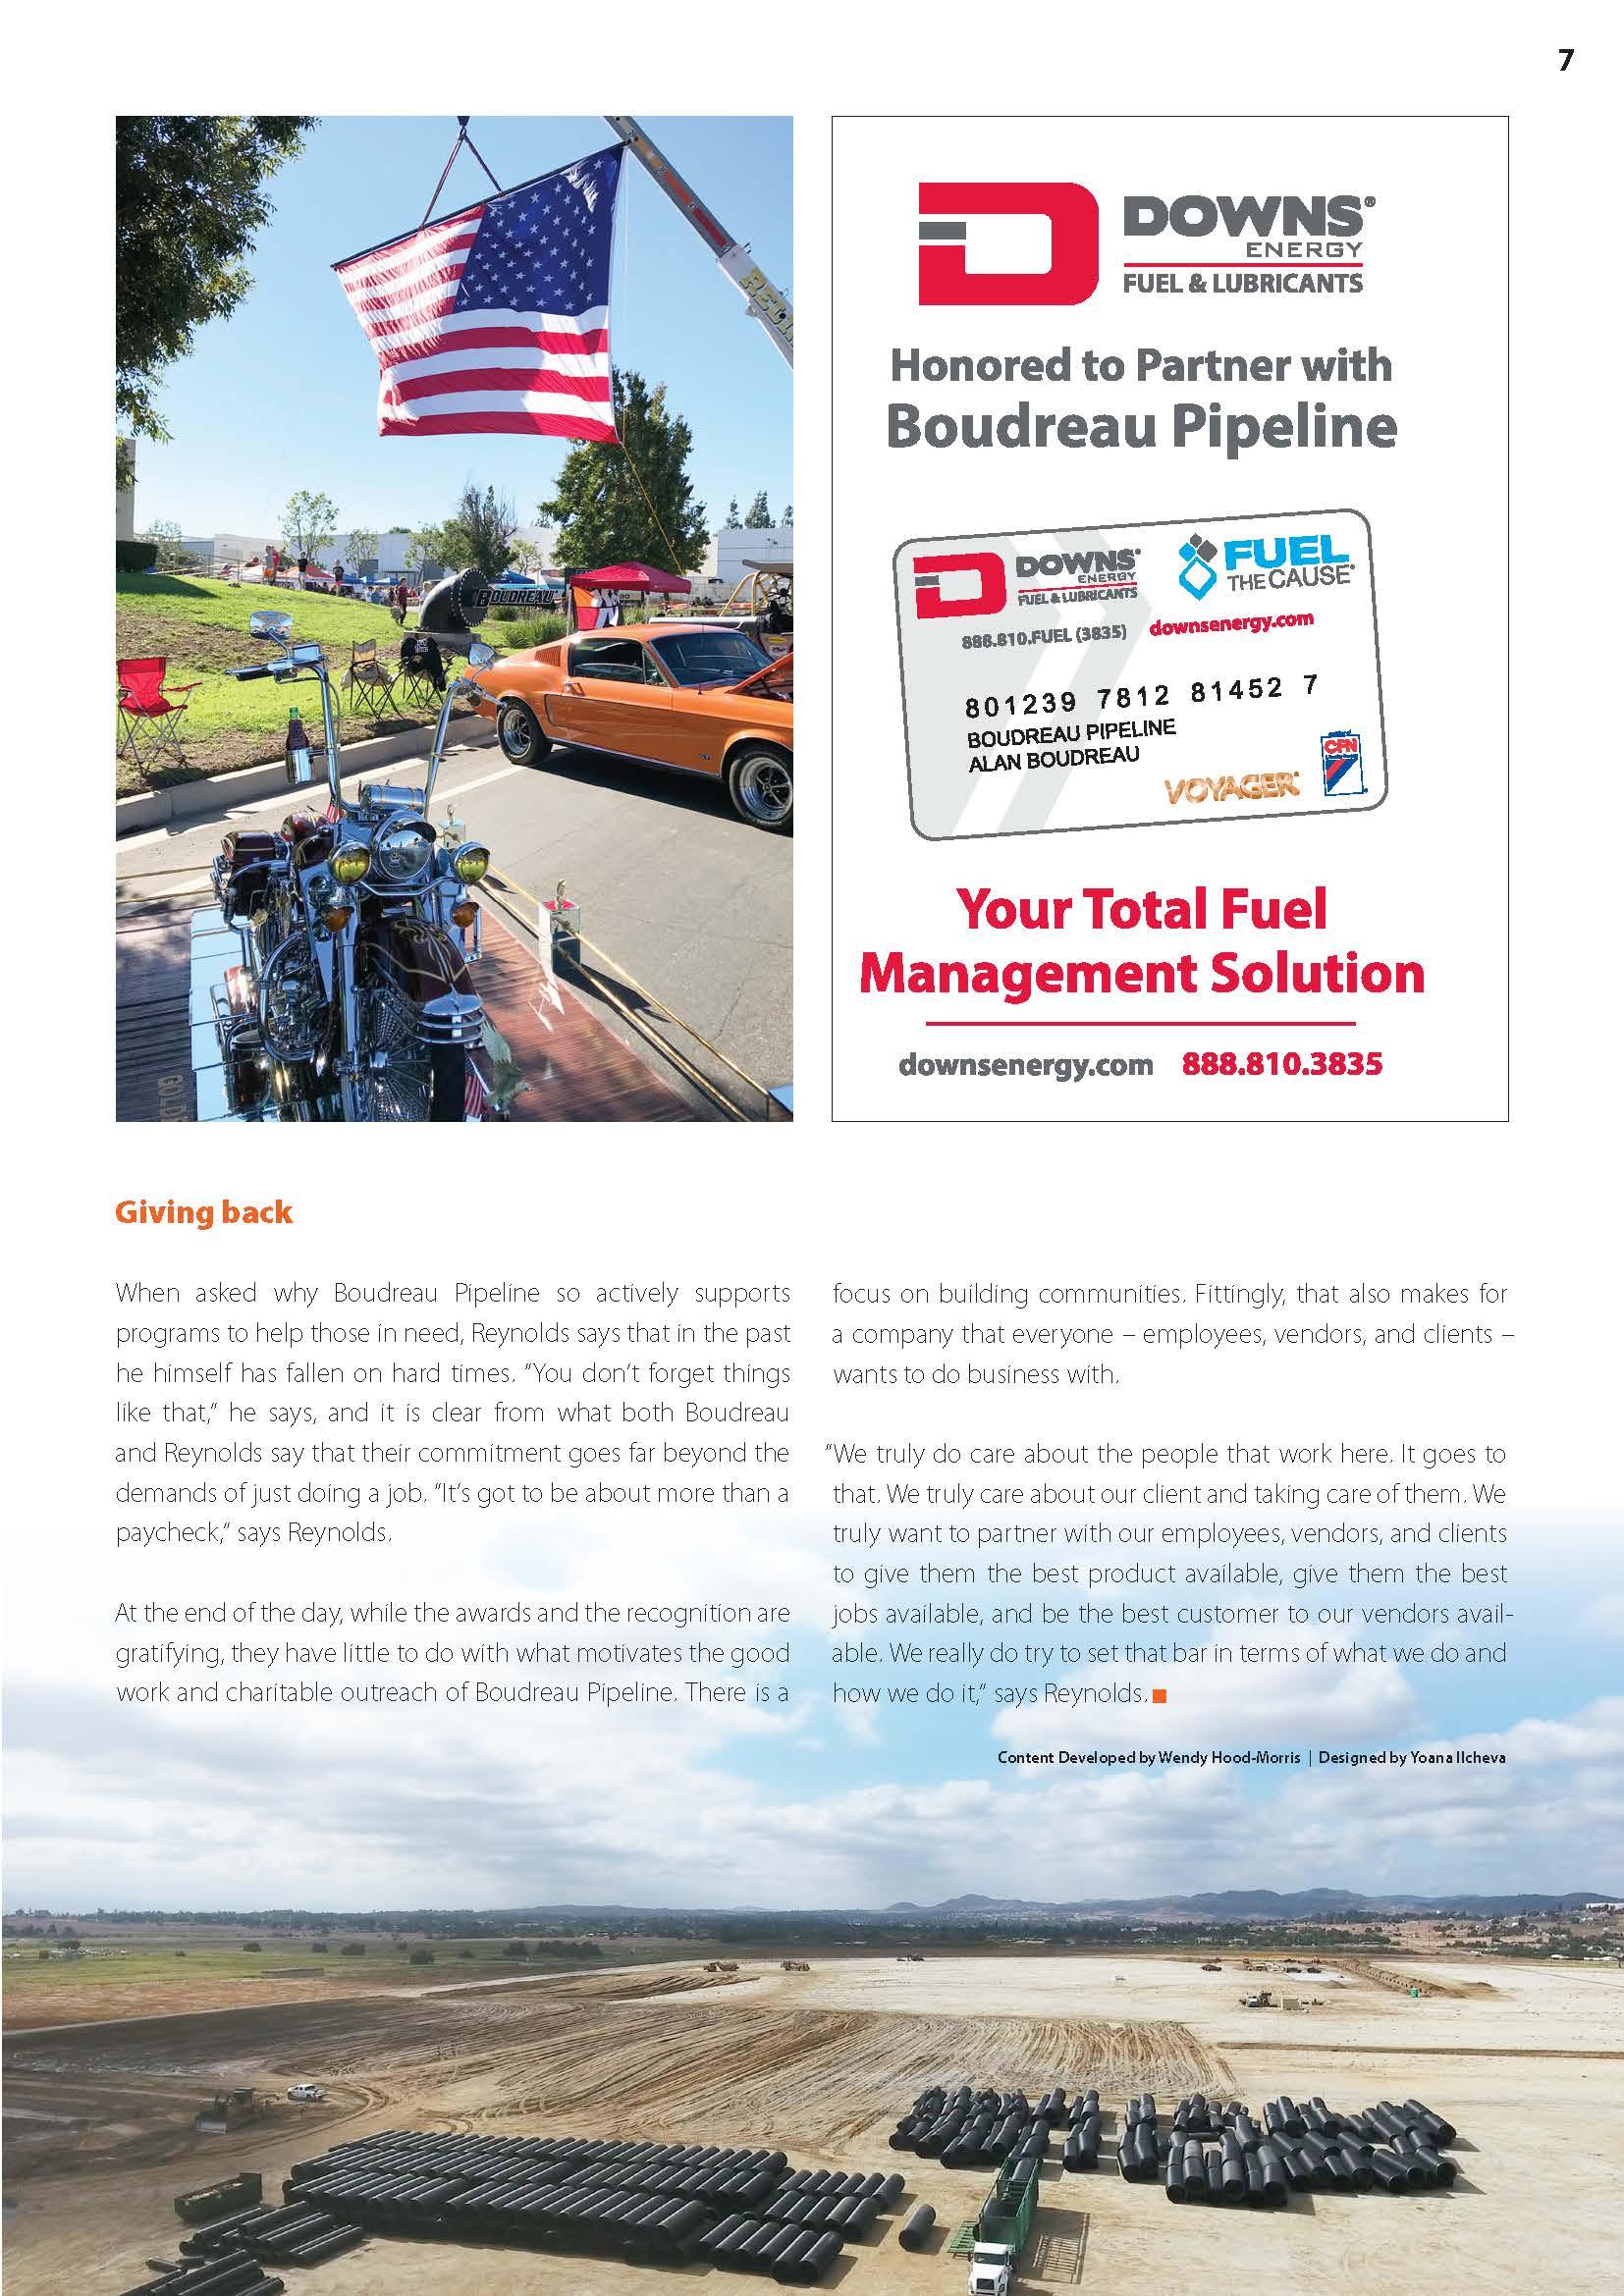 boudreau_pipeline_Page_7.jpg